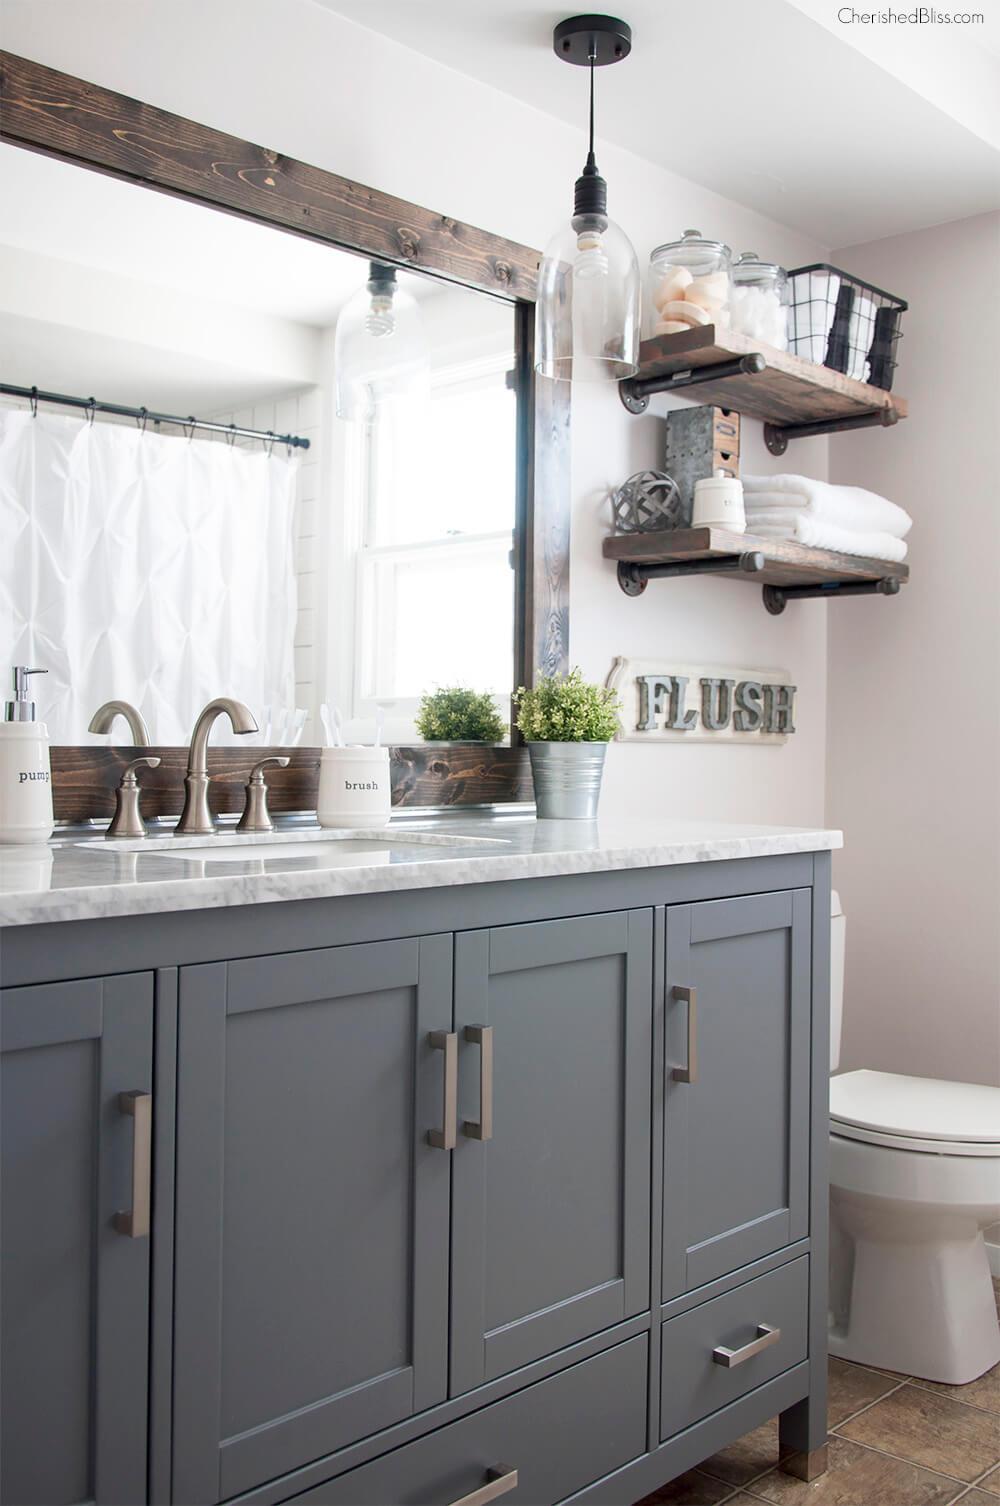 Simple Clean and Rustic Bathroom